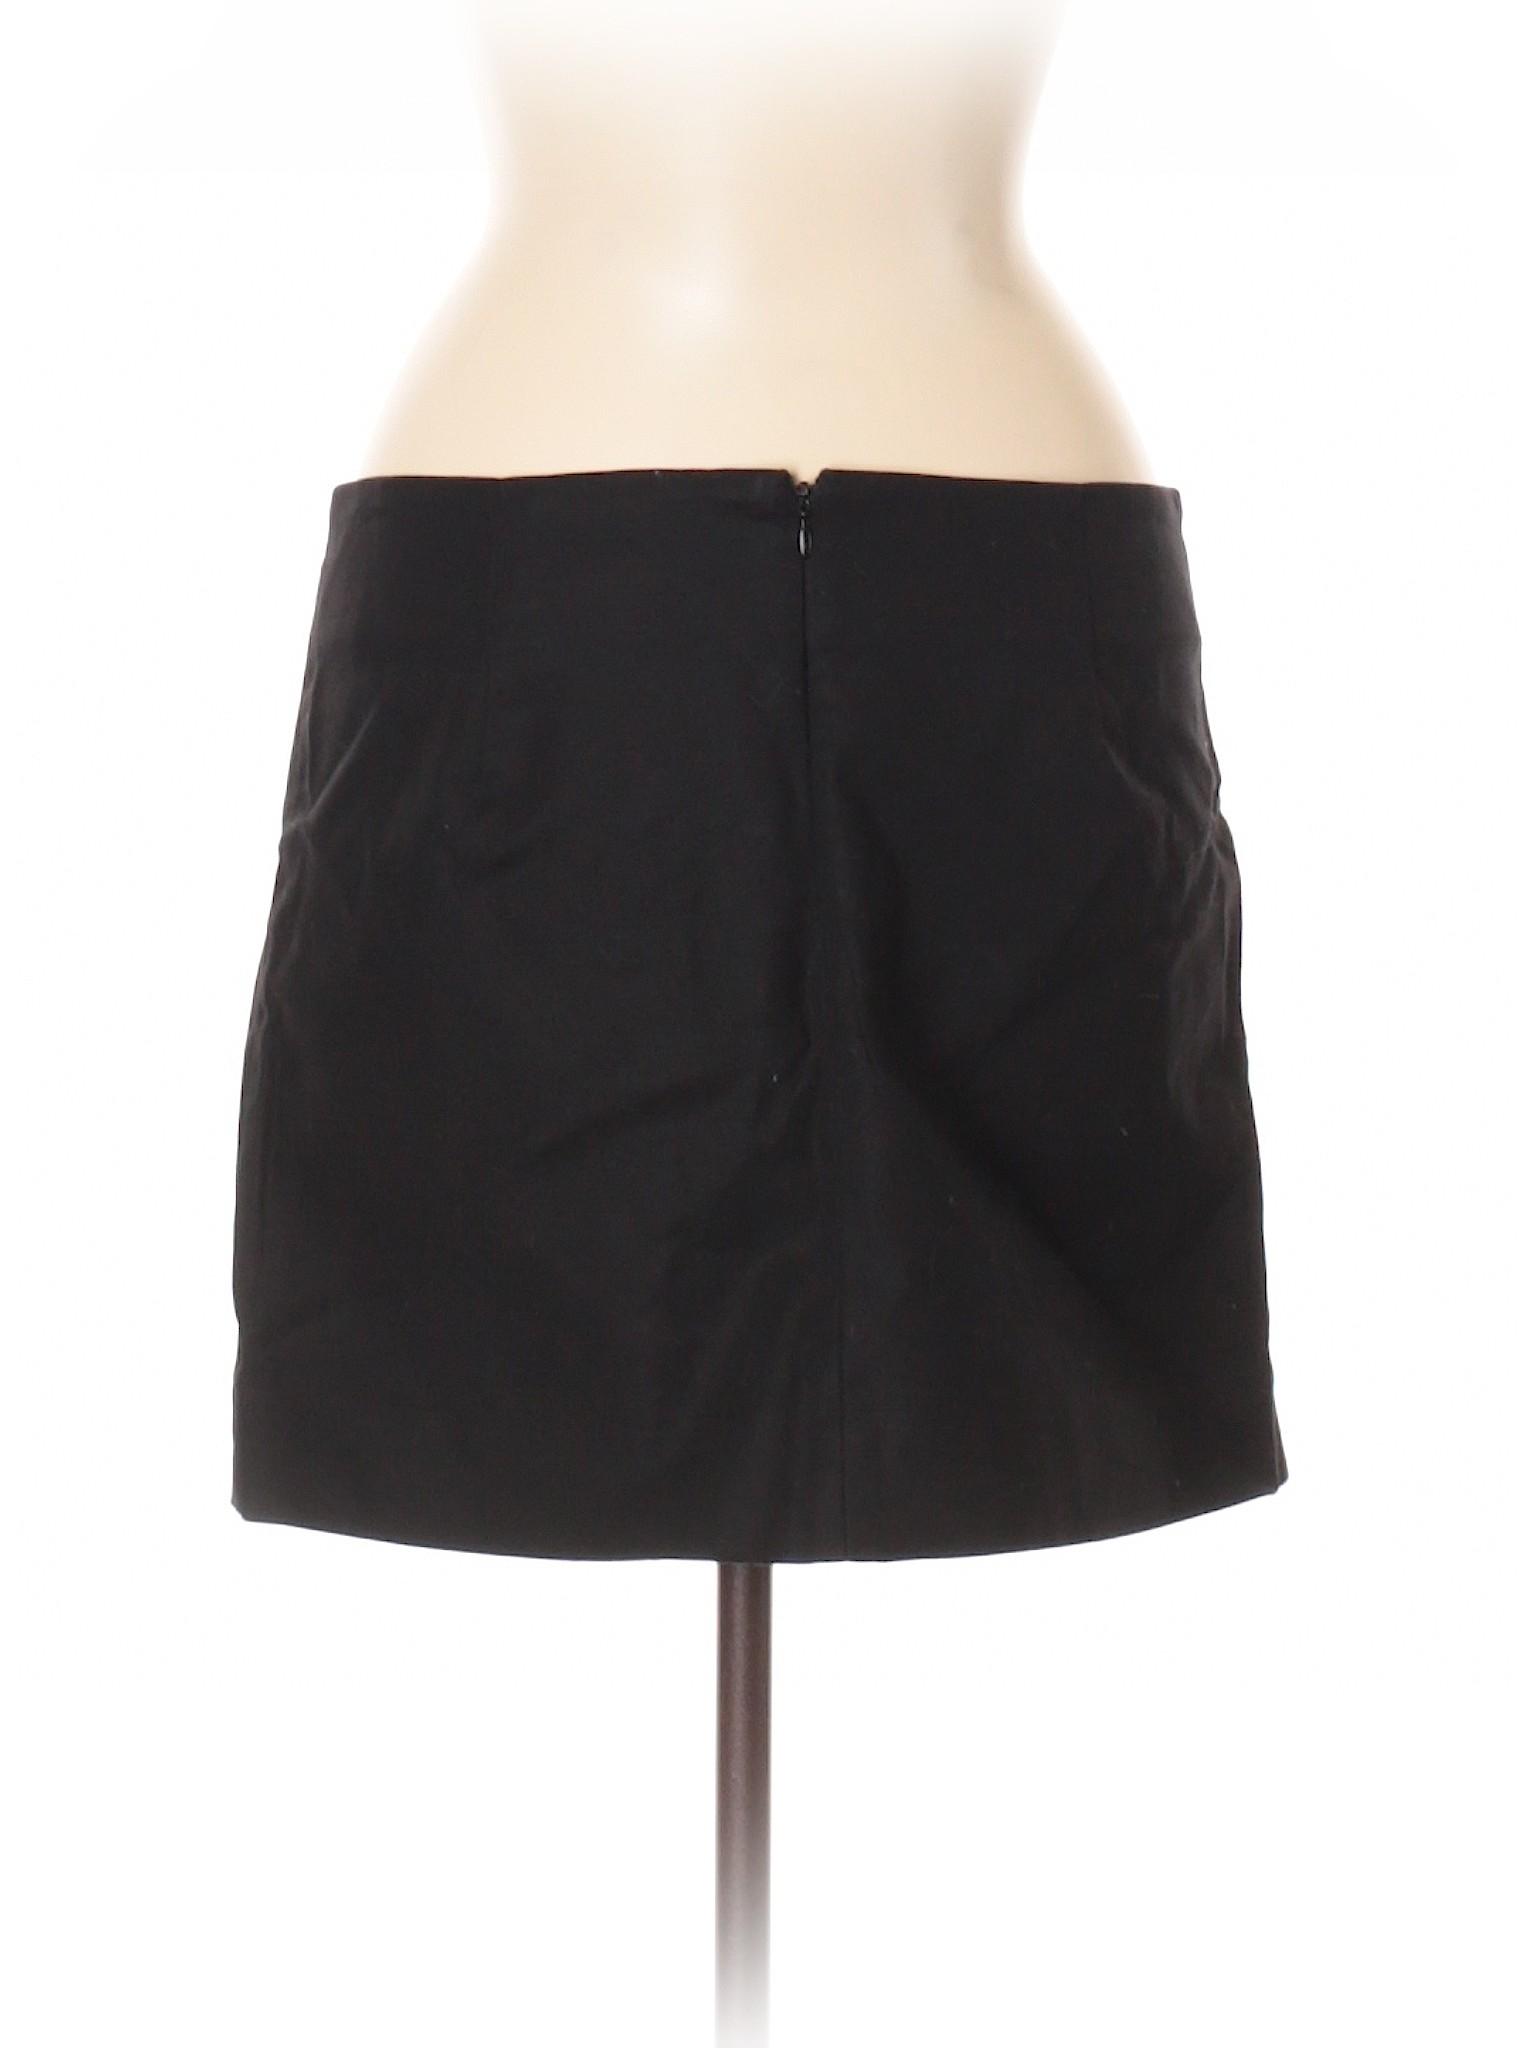 Skirt Fresh Boutique Joe Casual leisure nwWqZHCZ67